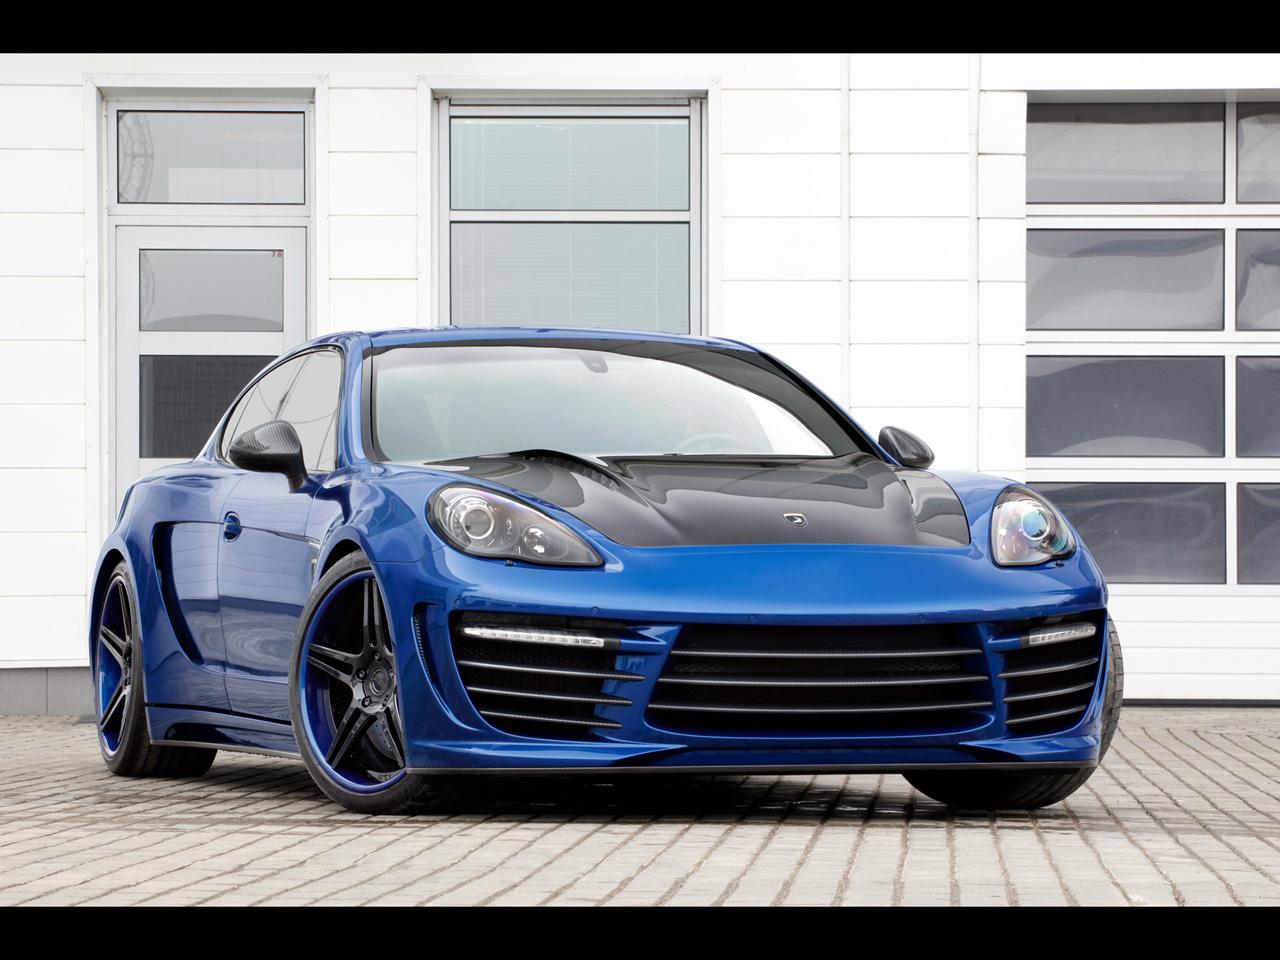 Cool Car 2012 TopCar Porsche Panamera Stingray GTR Hd Wallpapers | cartestimony